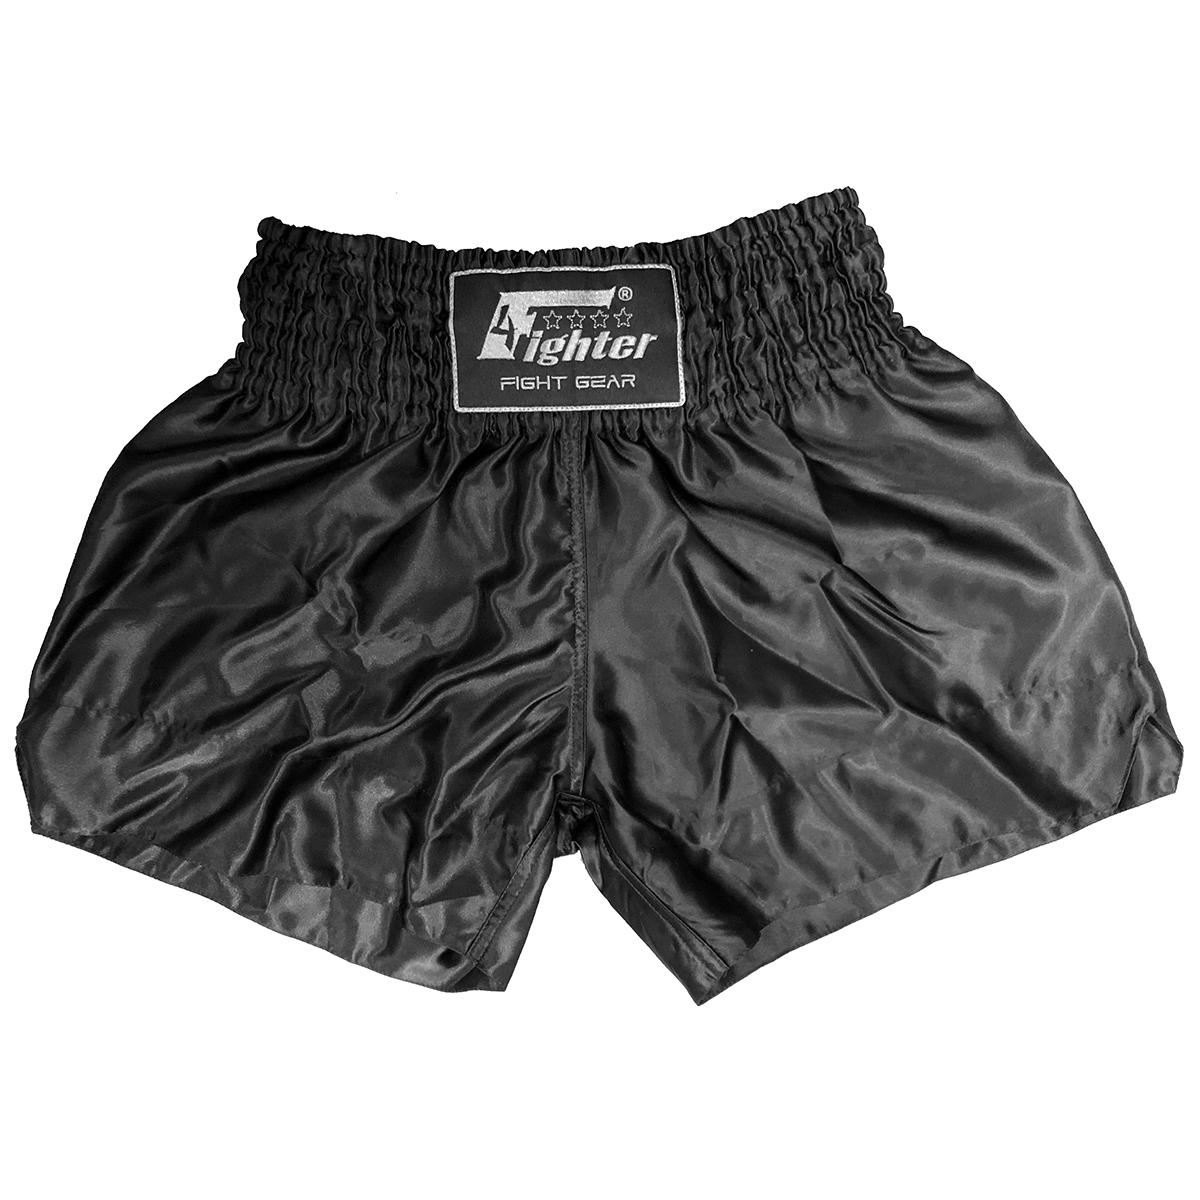 4Fighter Muay Thai Shorts Classic schwarz